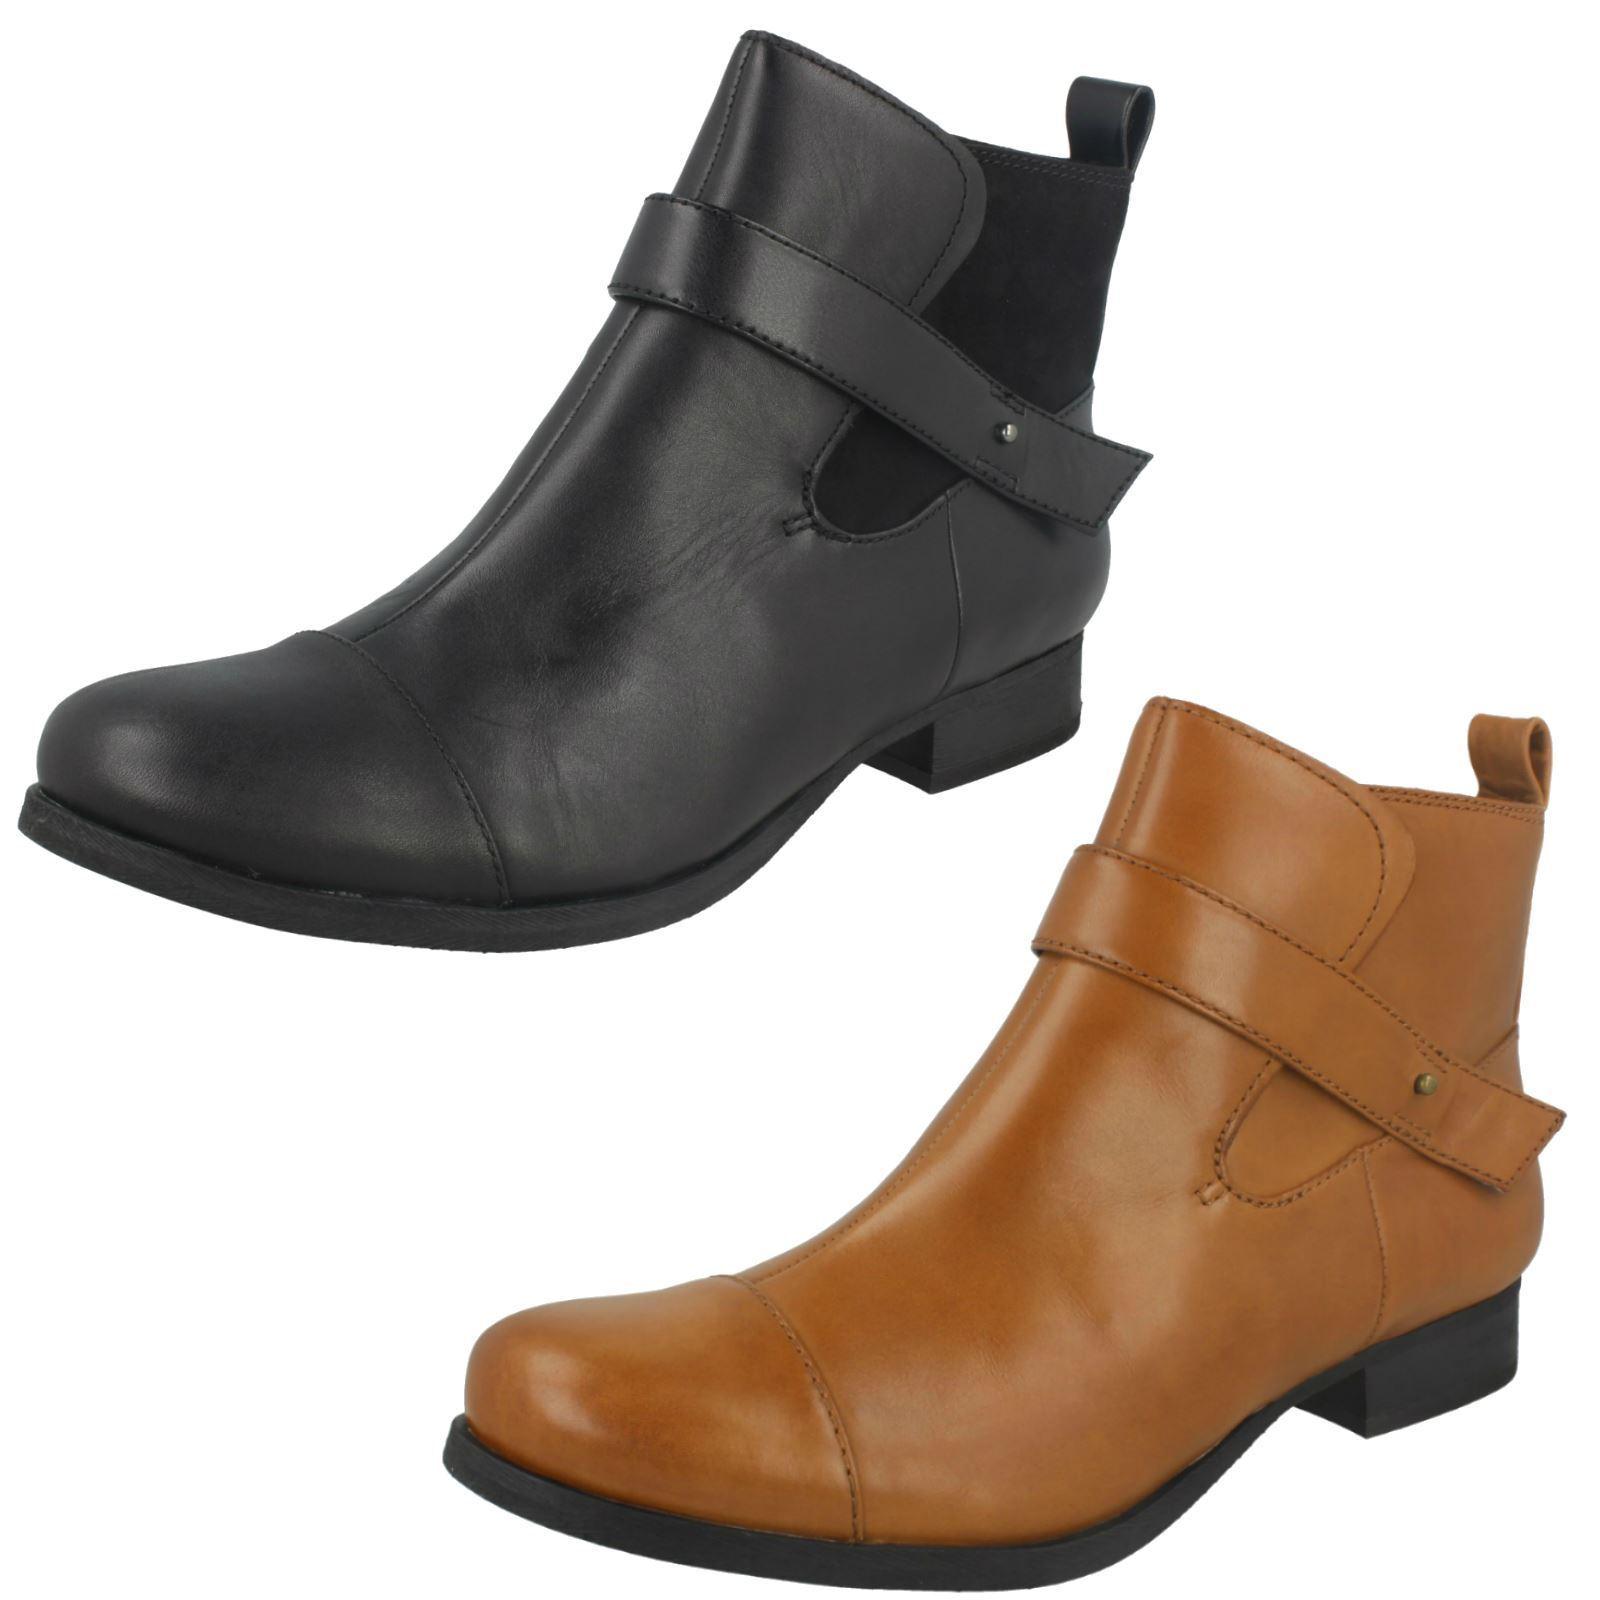 botas al tobillo Damas Clarks 'Ladbroke Magic'